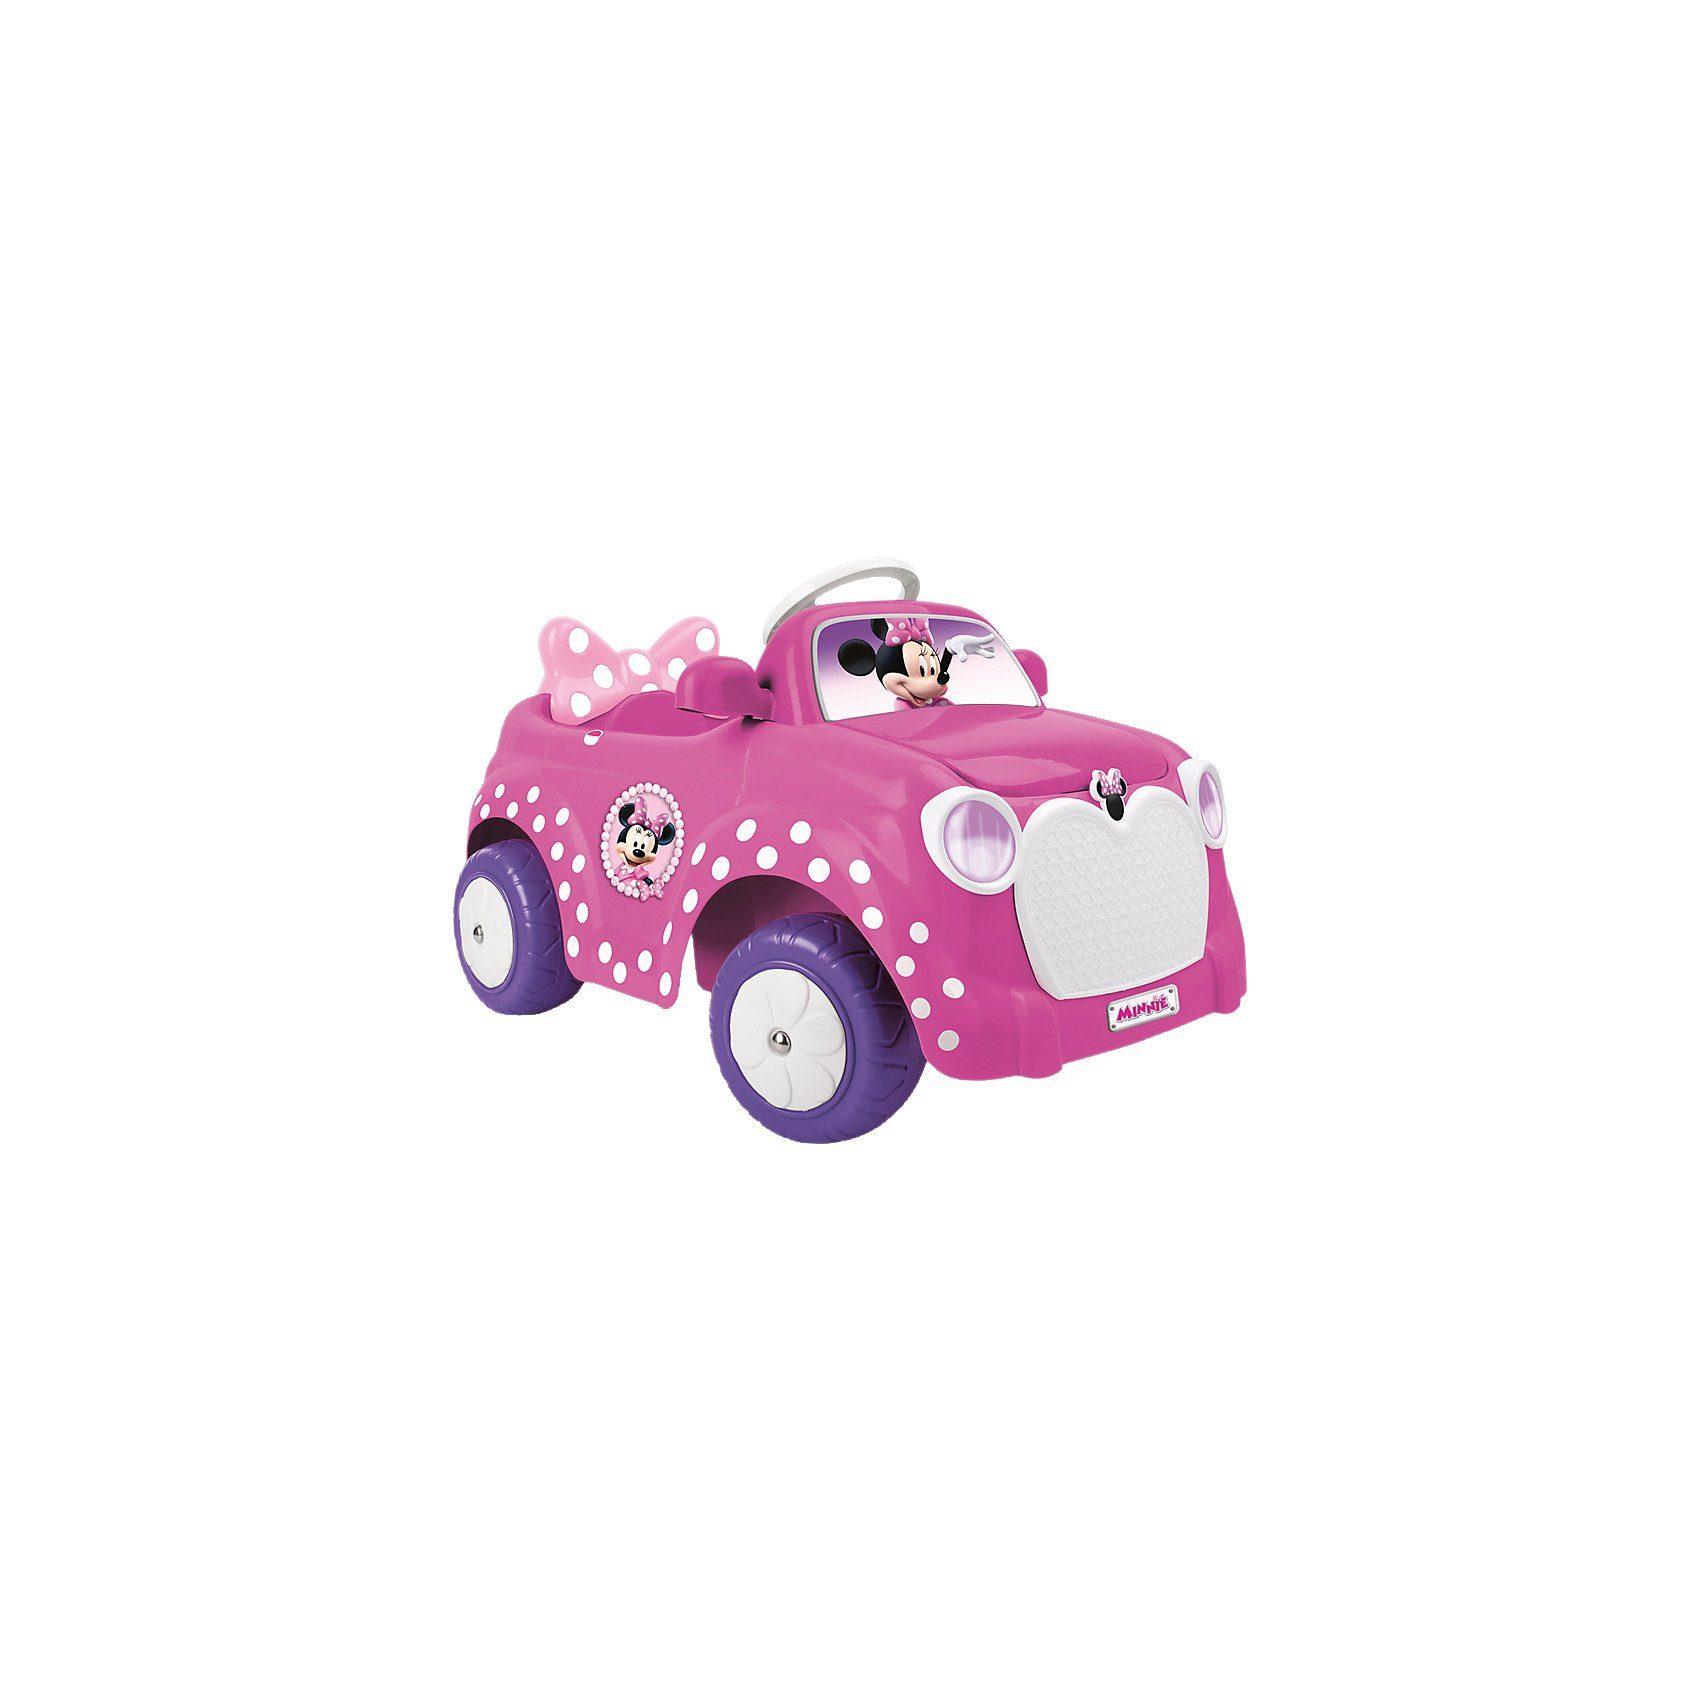 Feber Elektrofahrzeug Minnie Car 6V RC